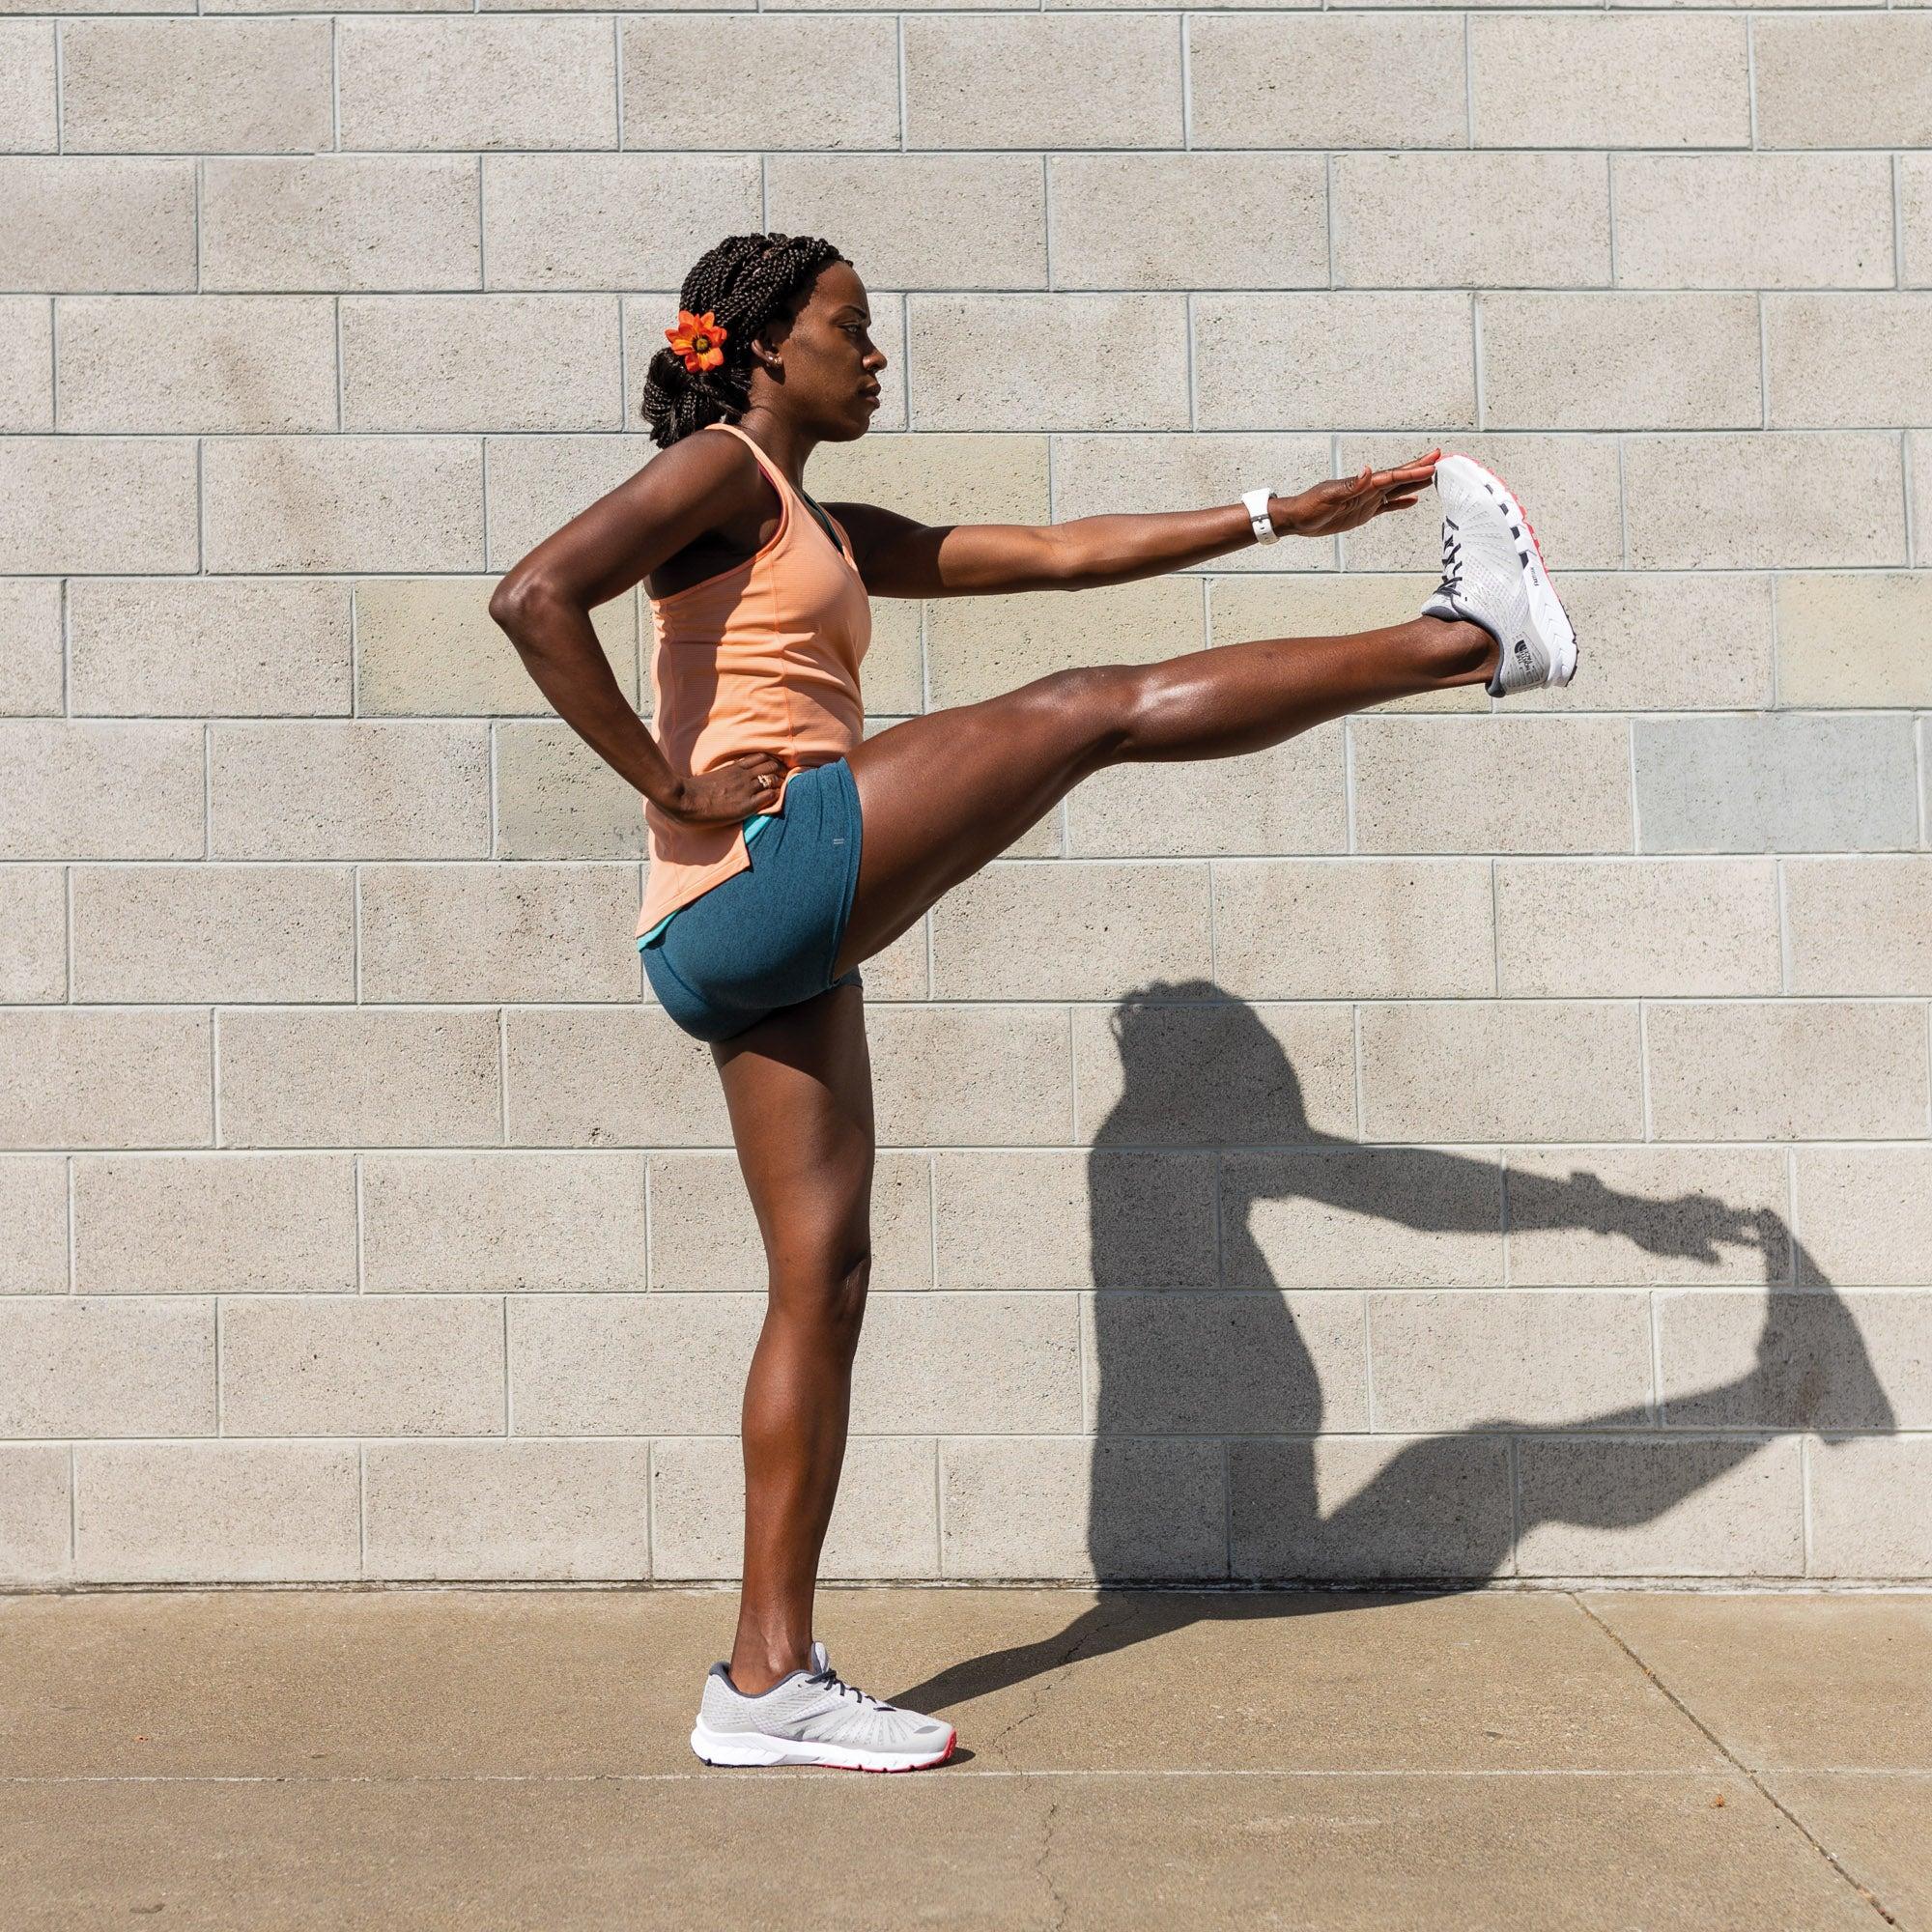 Alysia Montano demonstrating a forward leg swing